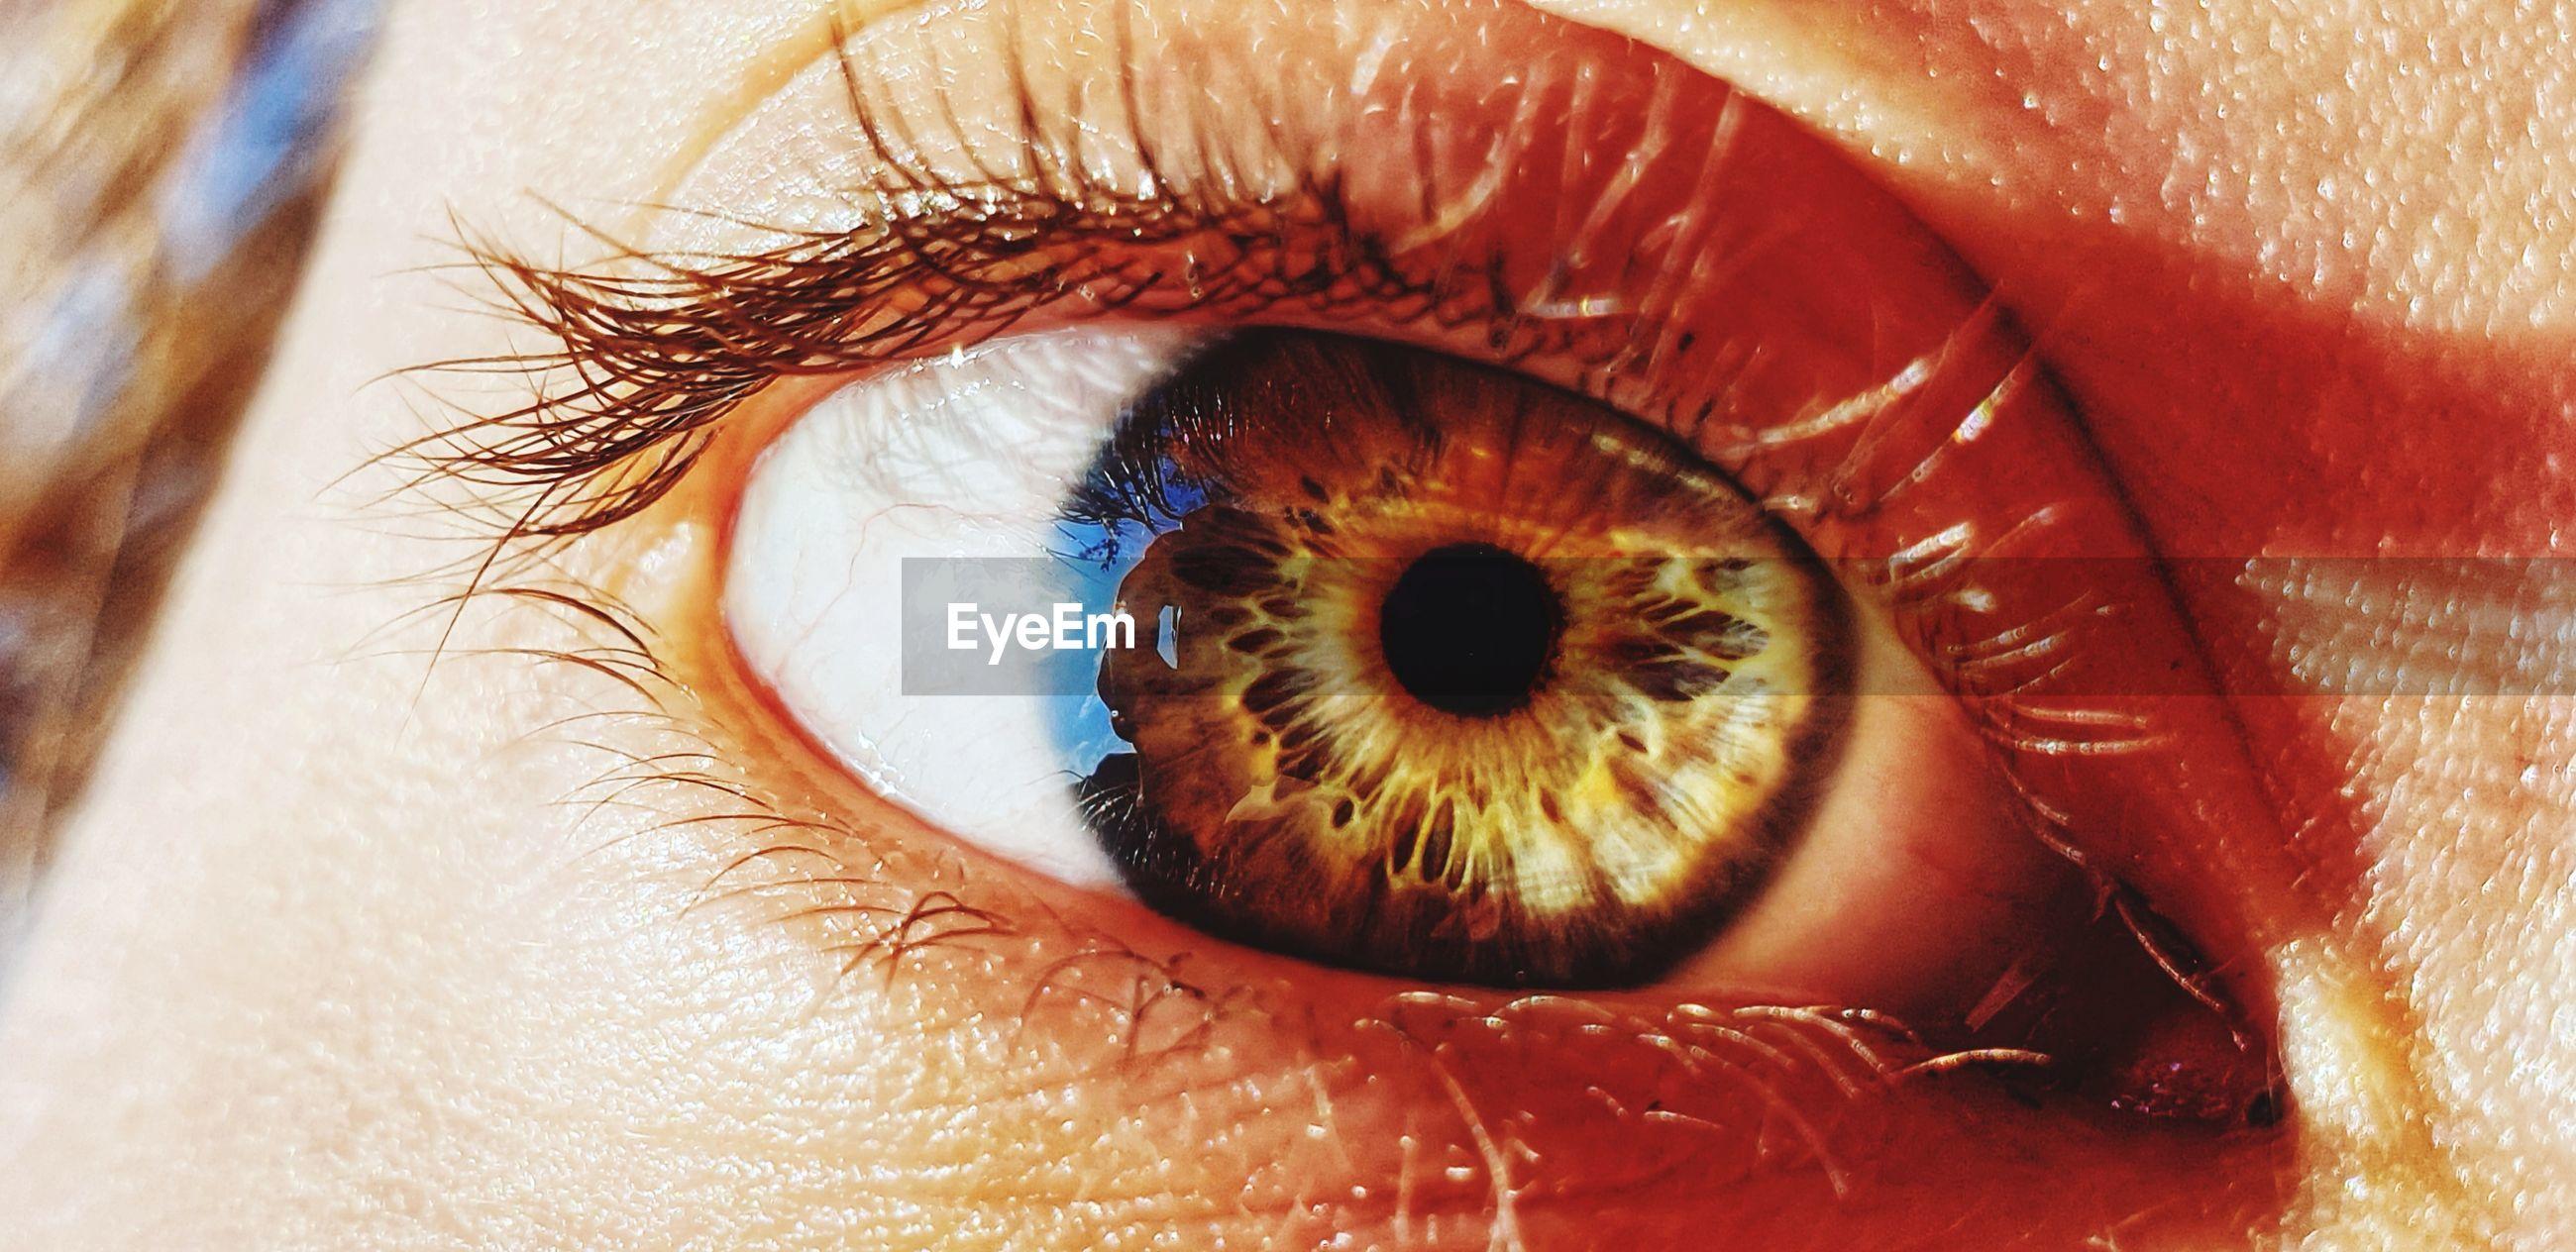 Cropped portrait of woman eye